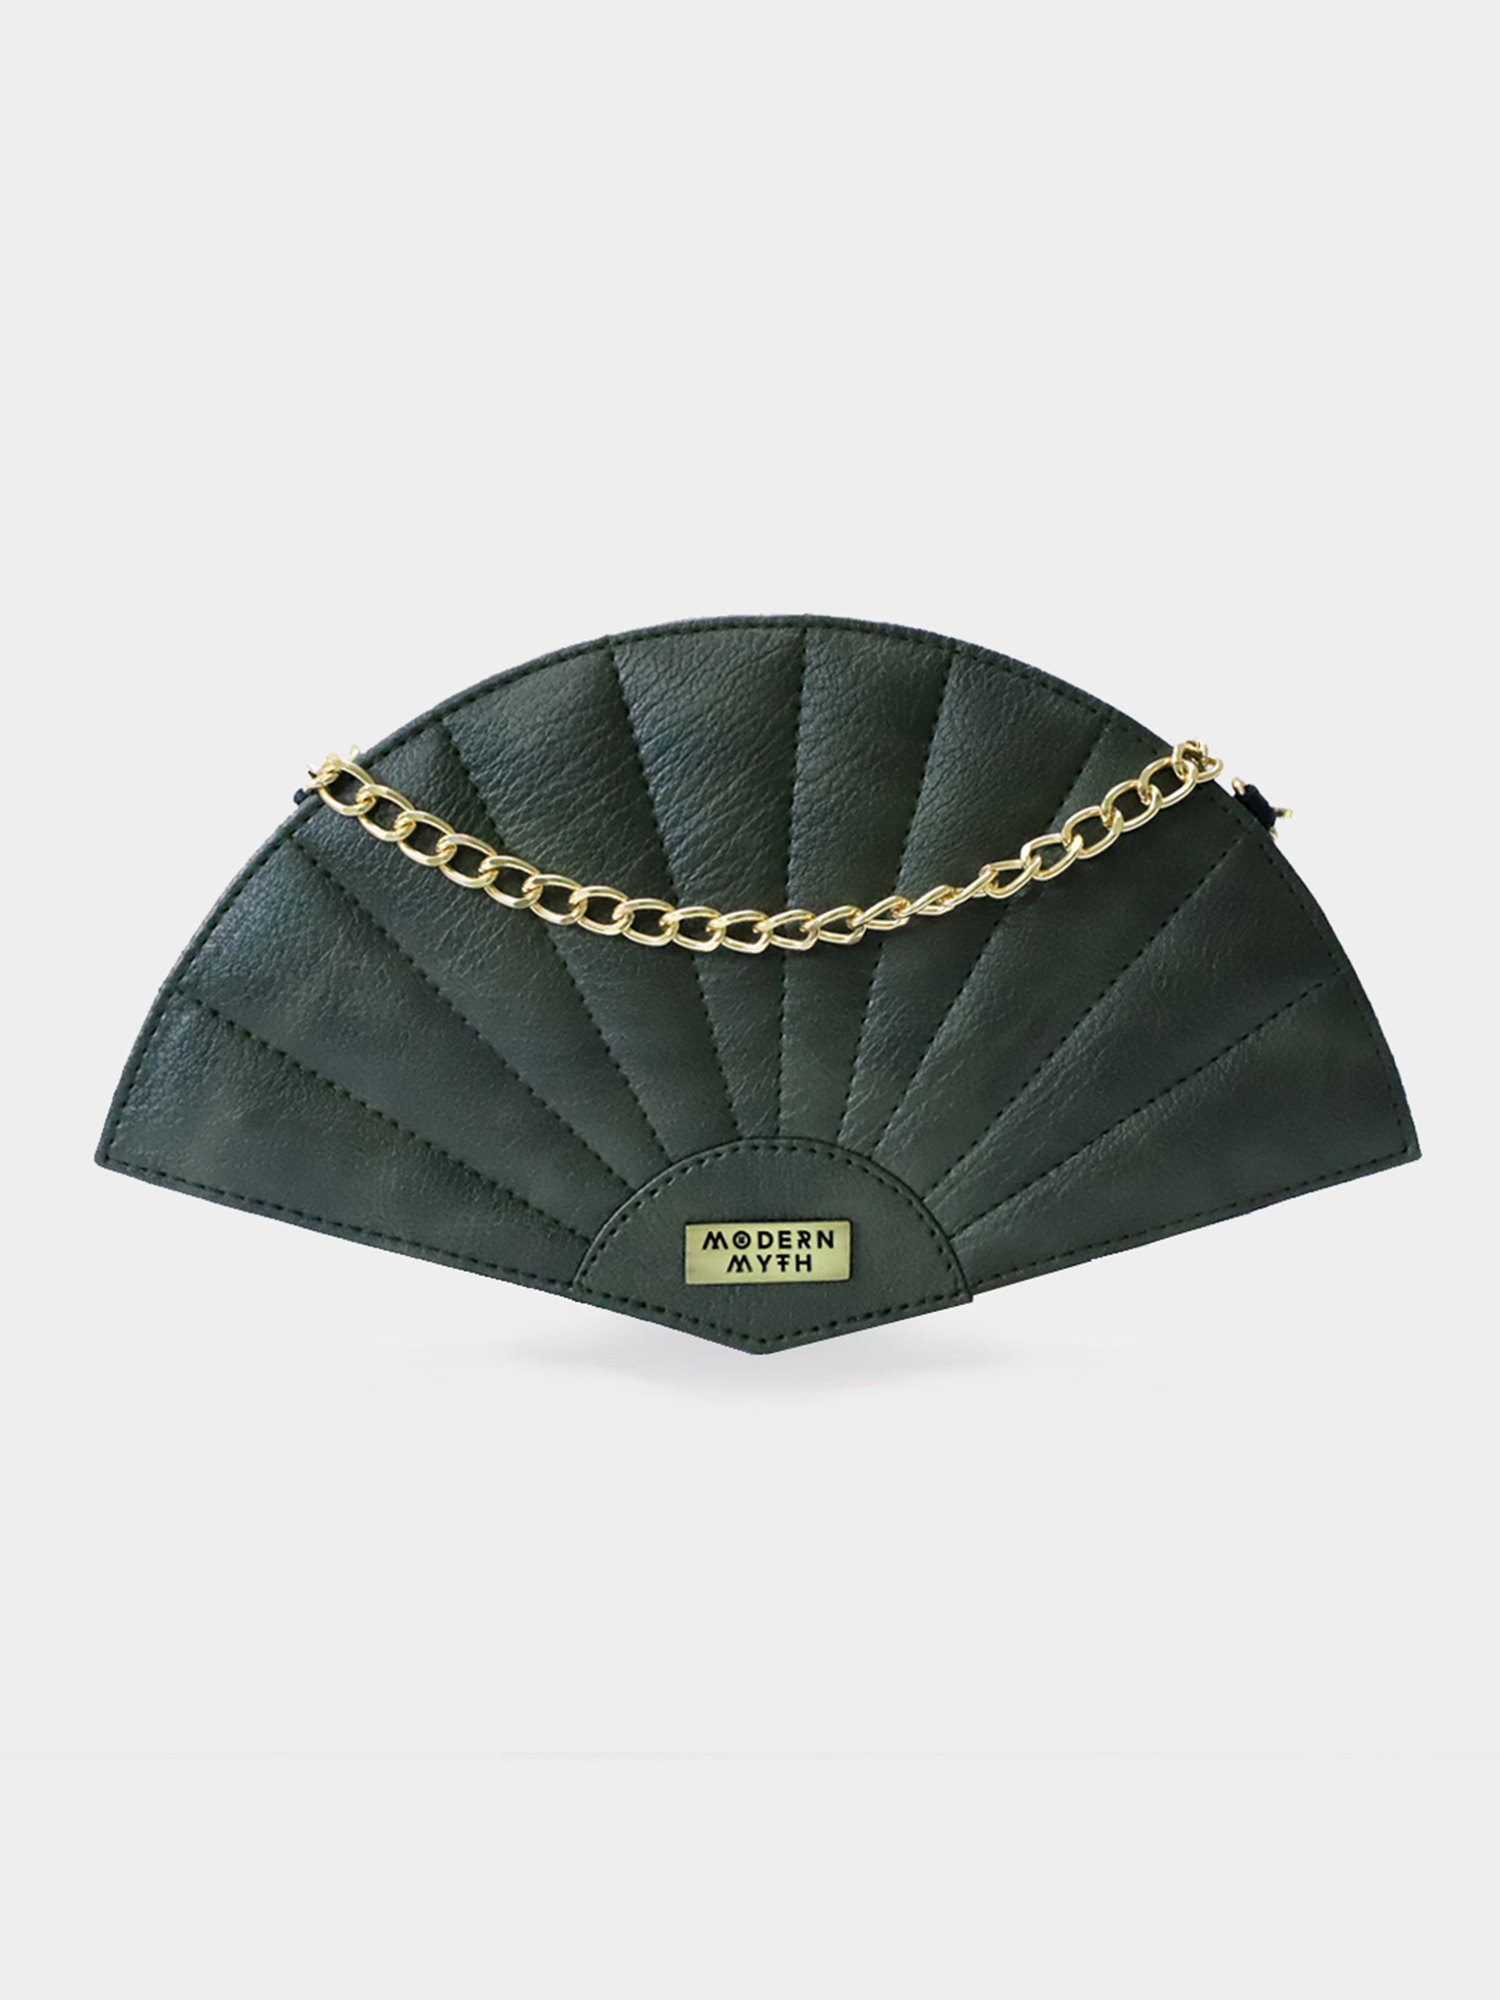 Modern Myth | Olive Textured Fan Bag